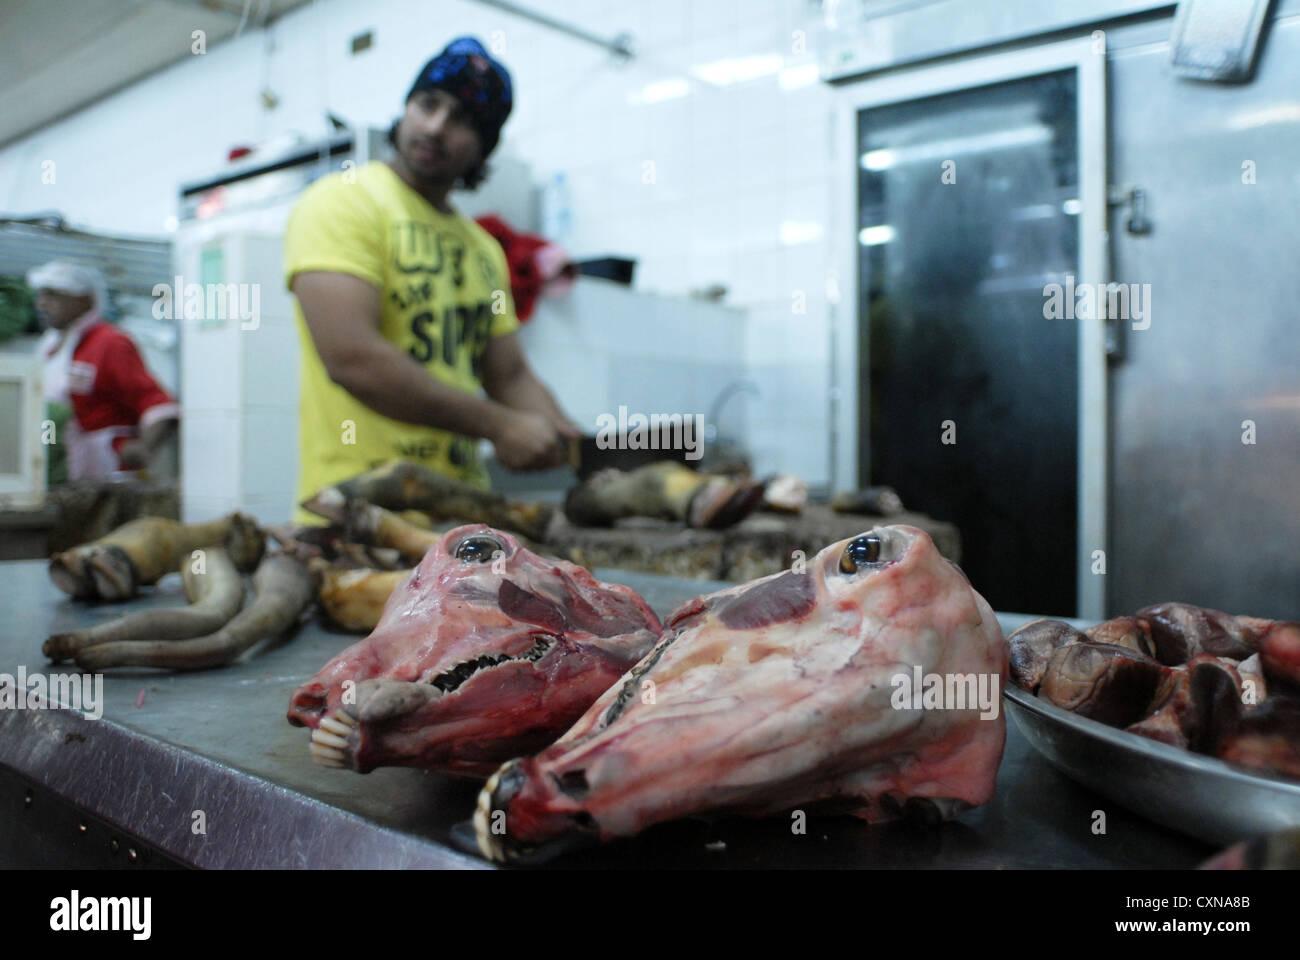 Dubai Butcher Stock Photos & Dubai Butcher Stock Images - Alamy